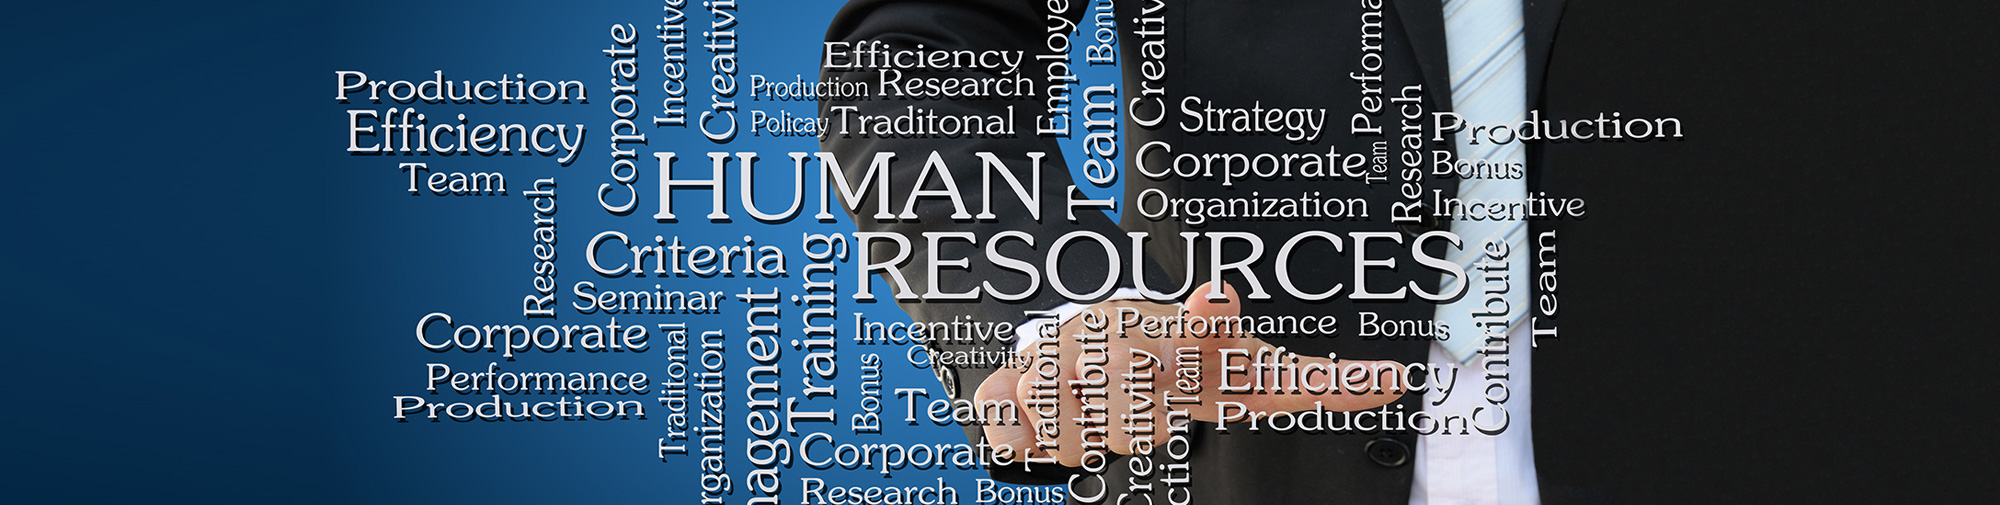 http://www.gekterna.com/userfiles/11e3ebfa-92f9-4083-8c5b-a26d00fe9b3c/Human_Resources_1.jpg